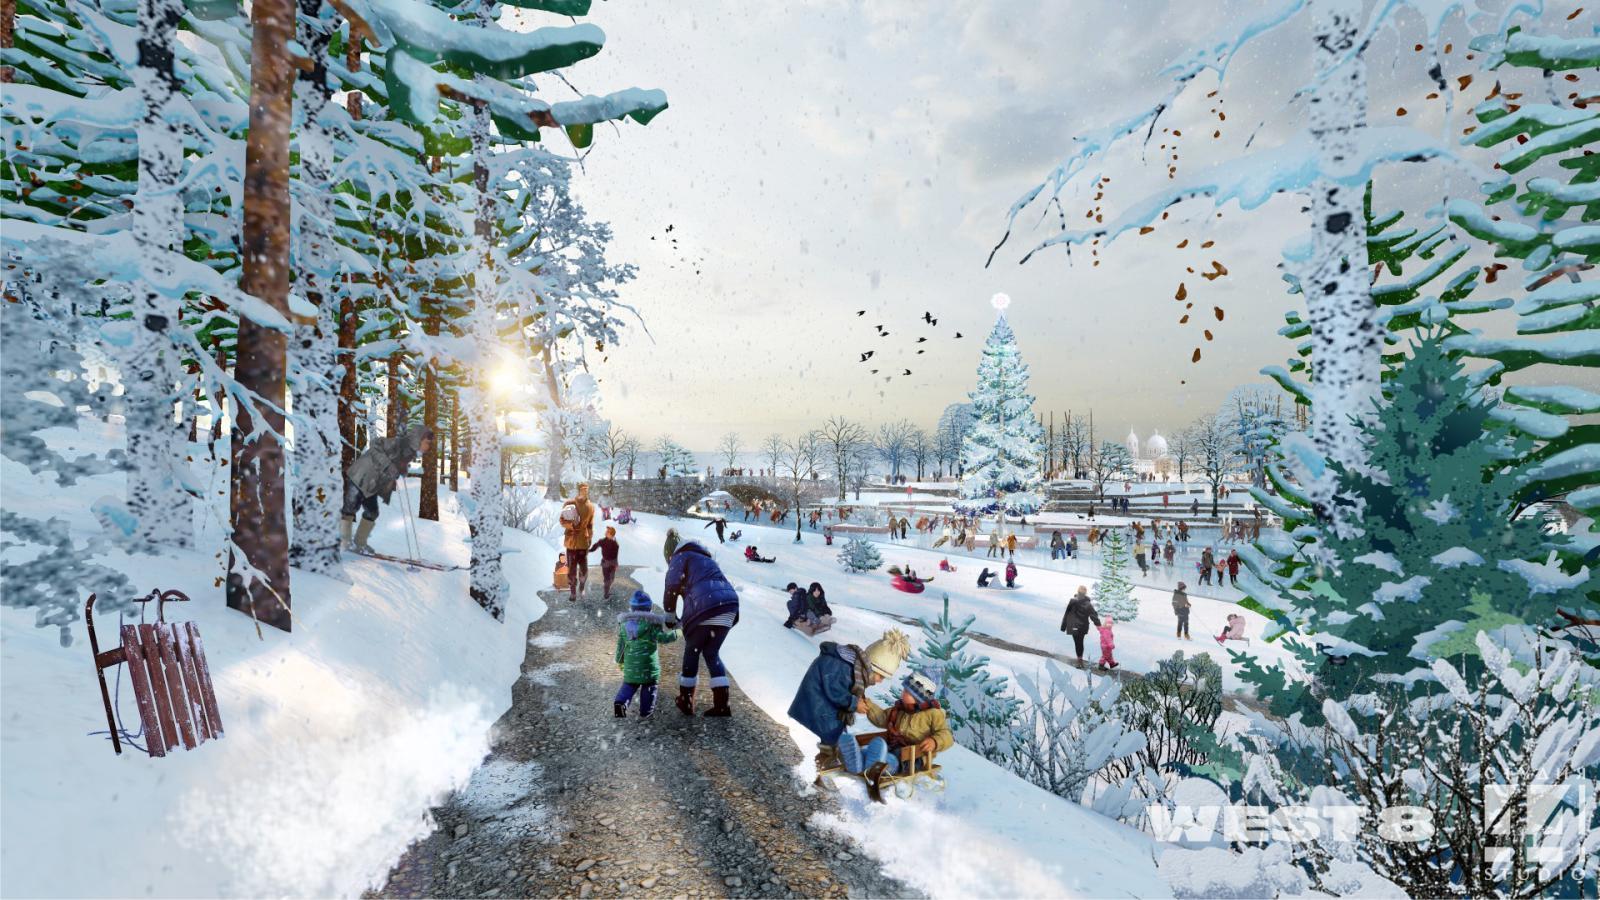 Tuchkov Buyan Park